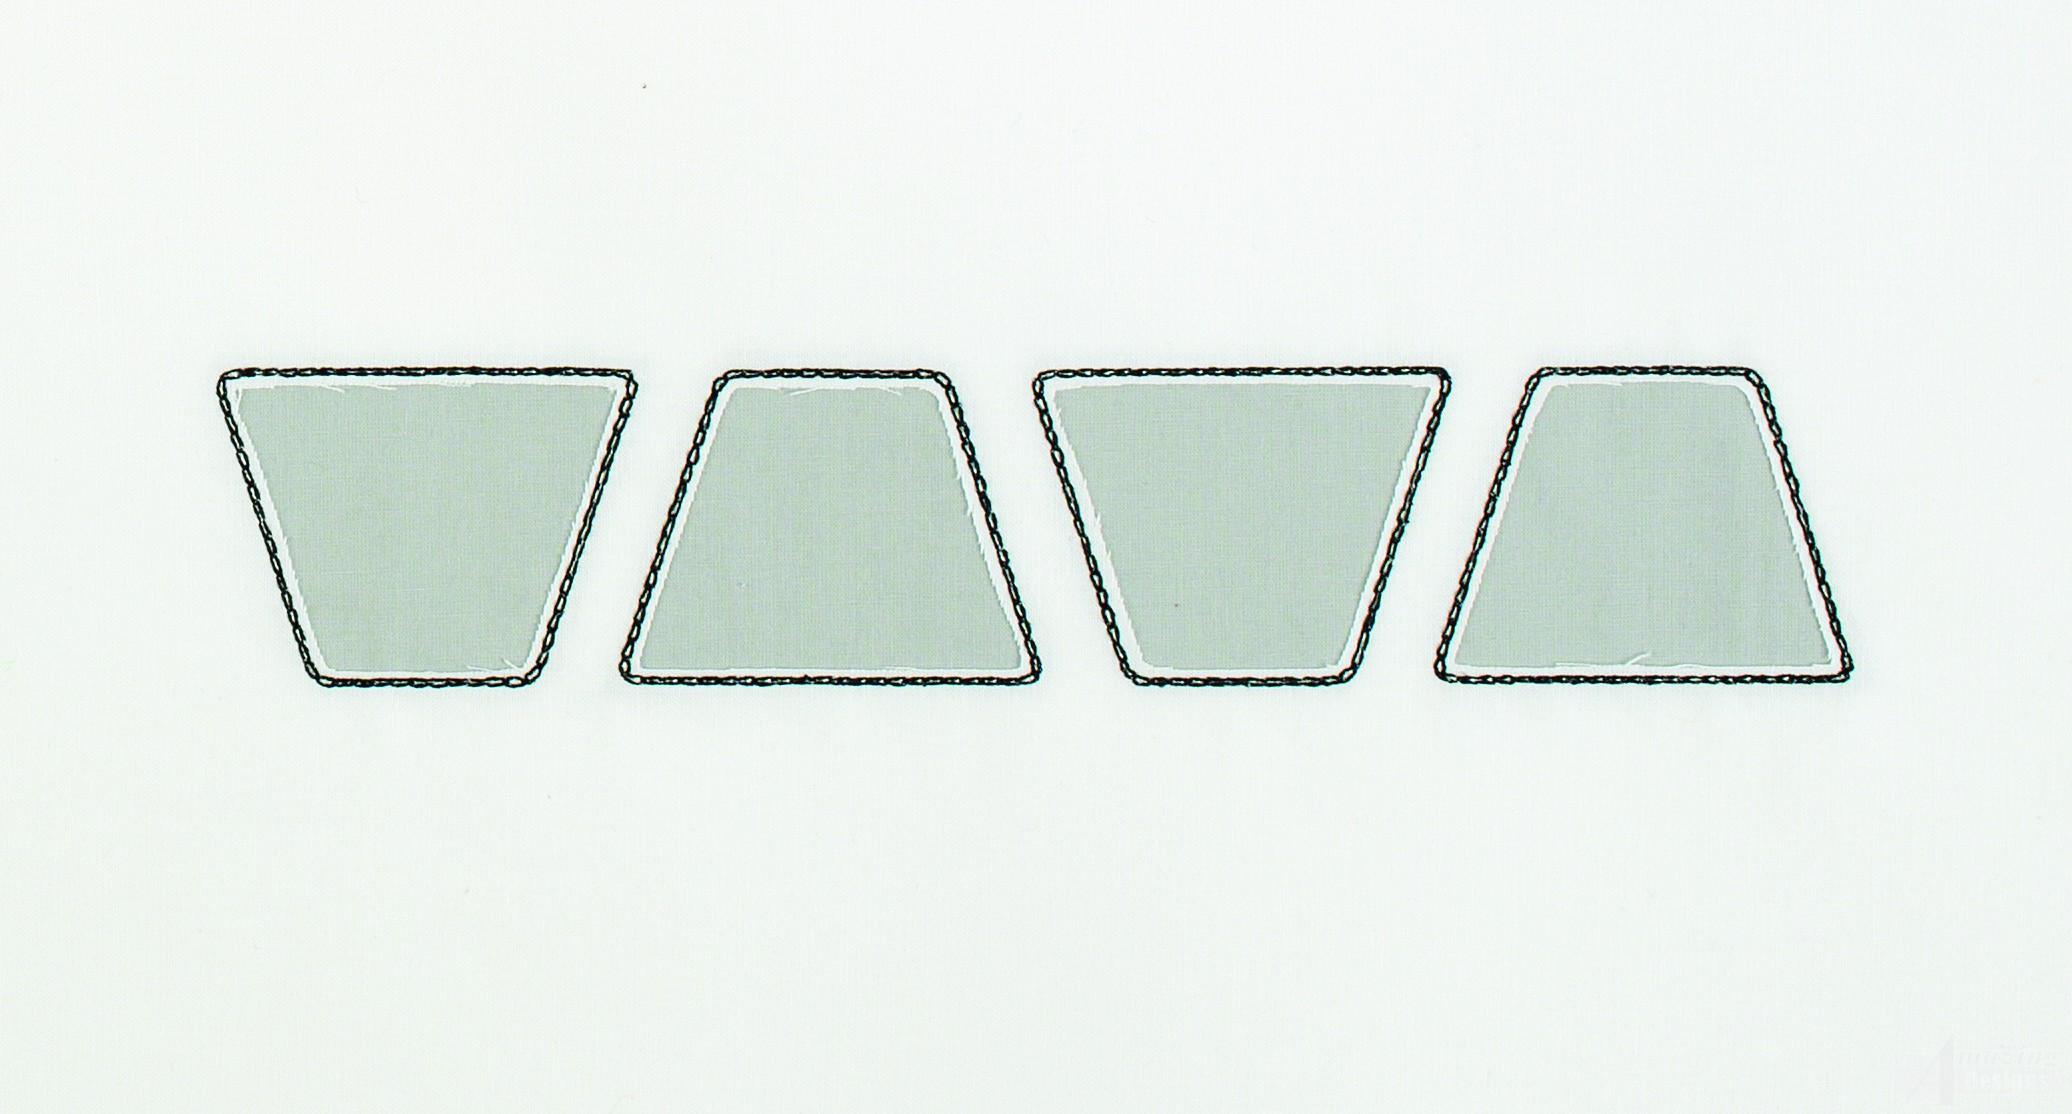 Trapezoid line reverse applique embroidery design